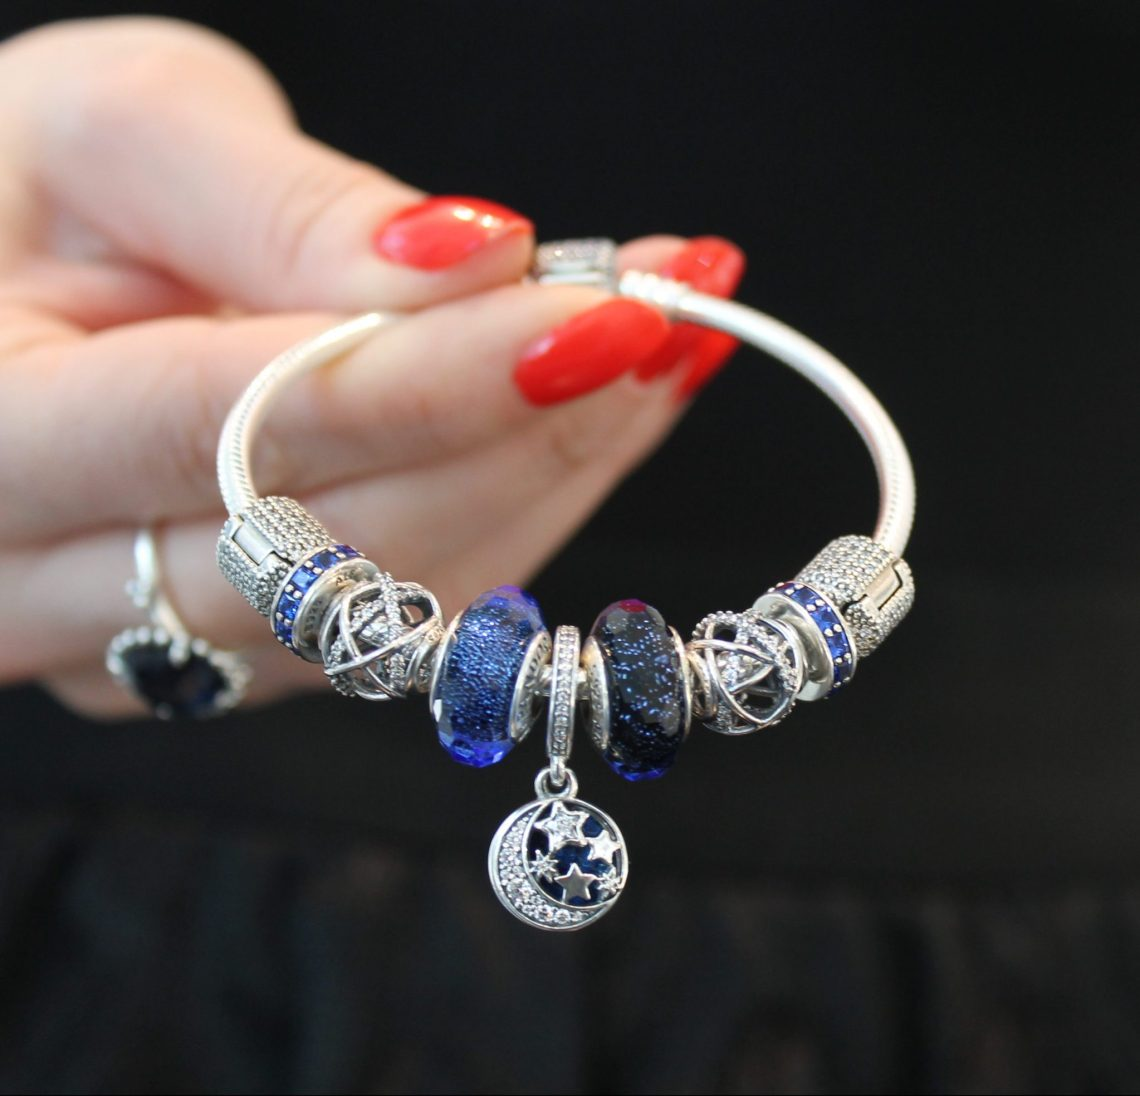 pandora-bracelet-danbury-ct